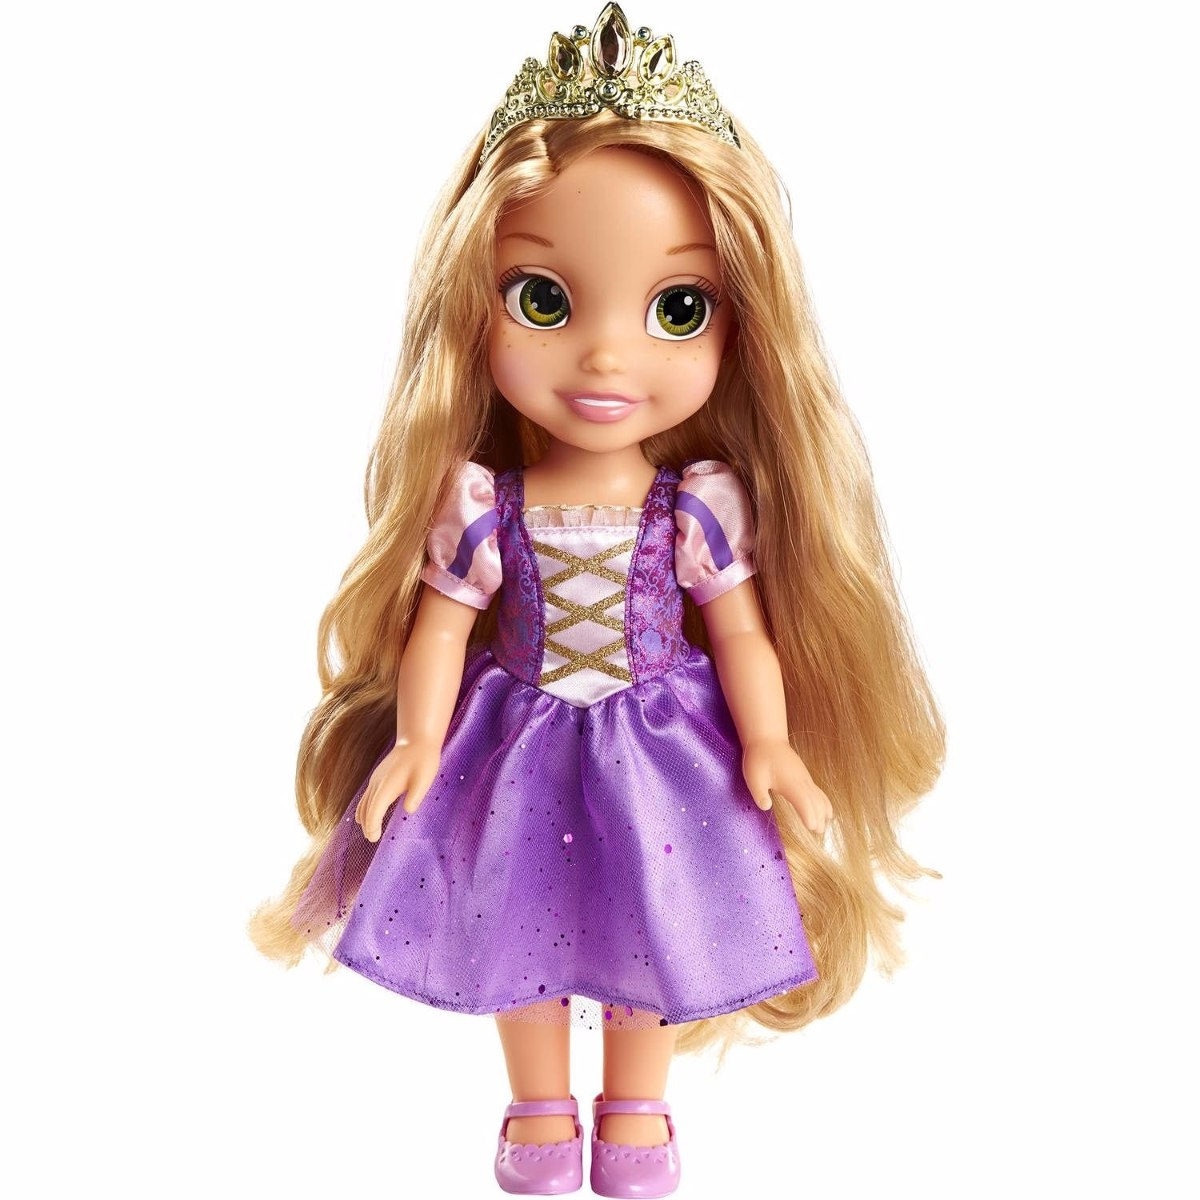 Nova Boneca My First Disney Princess Rapunzel Toddler Doll